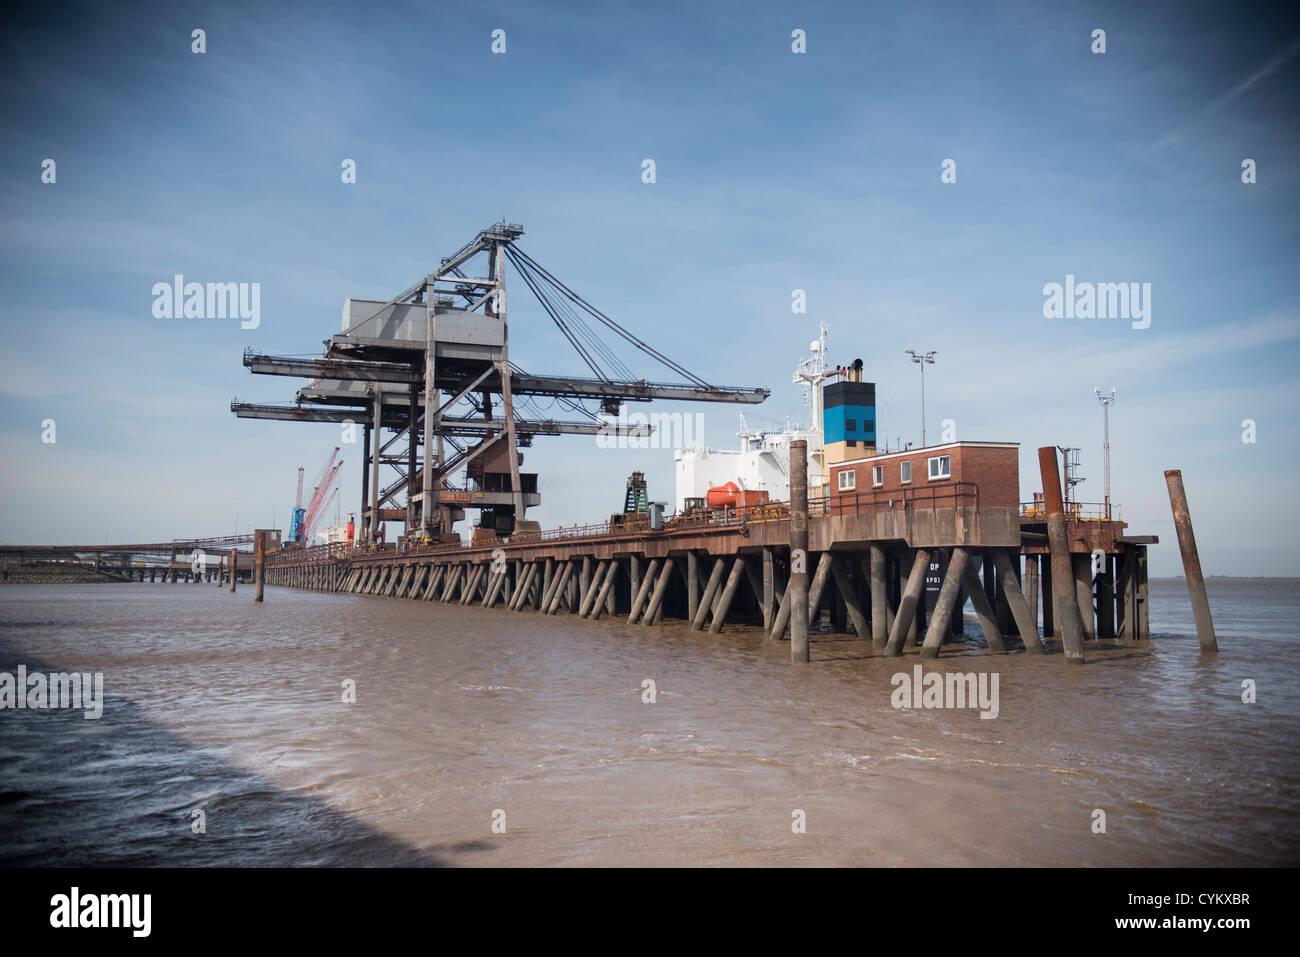 Cranes on wooden pier - Stock Image